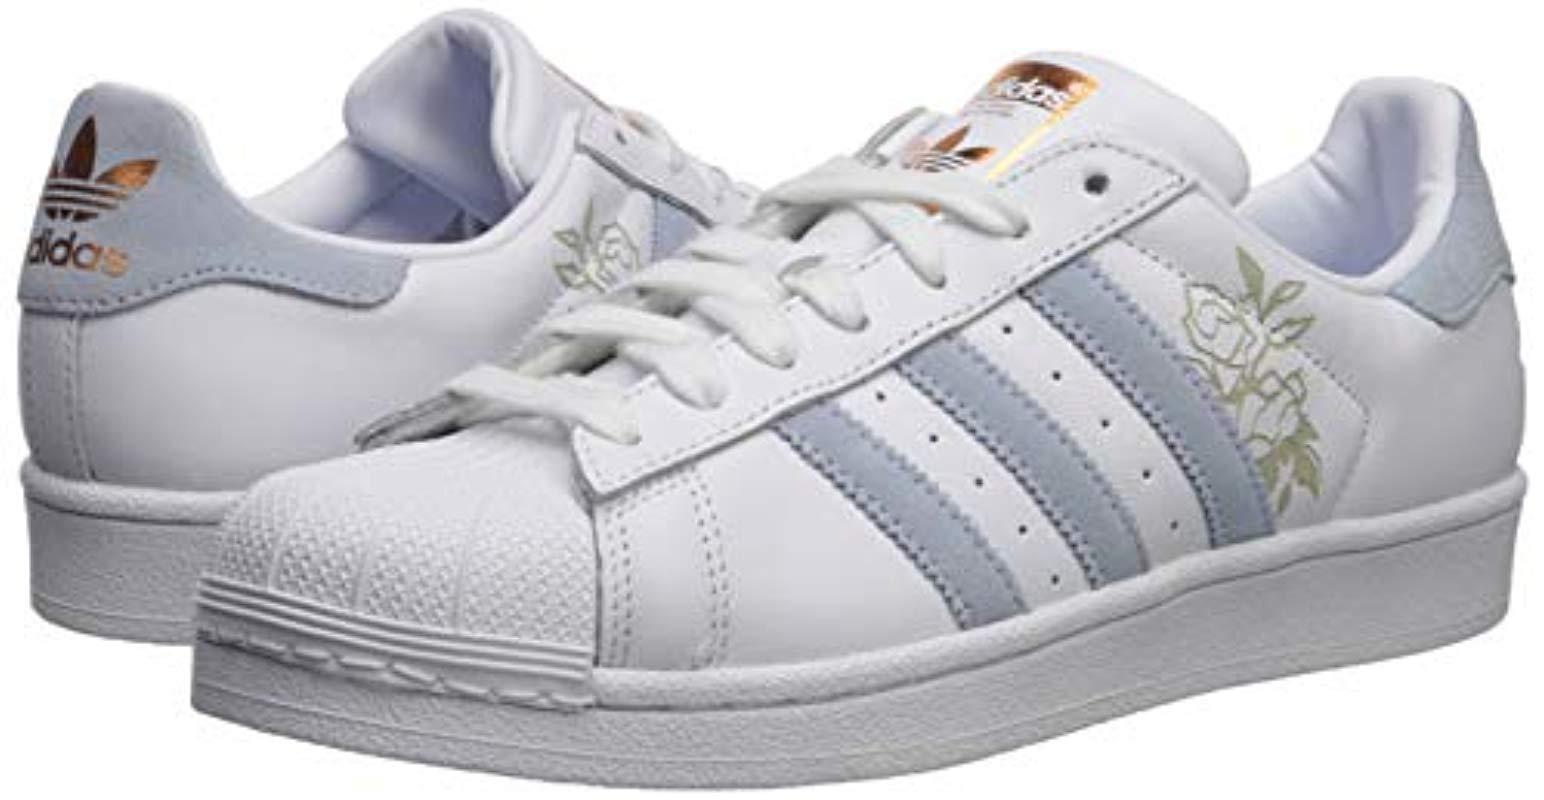 adidas Originals Superstar Shoe, White